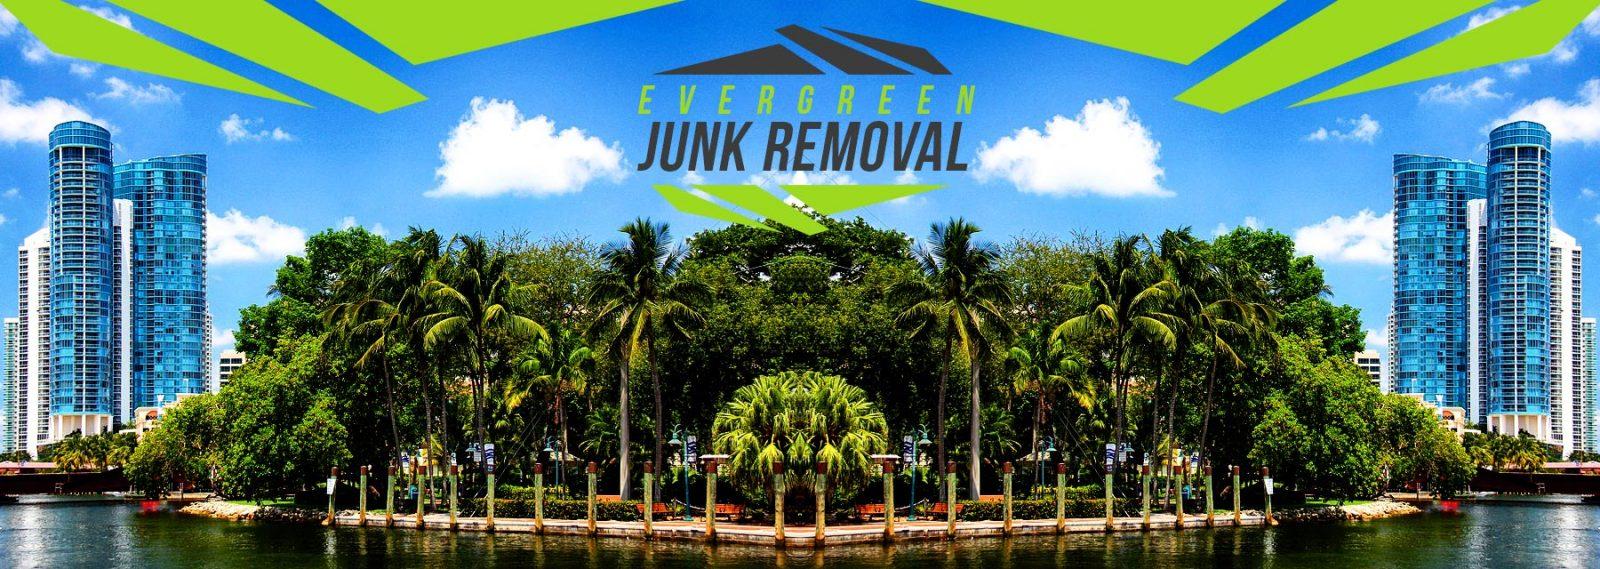 Cheval Hot Tub Removal Company